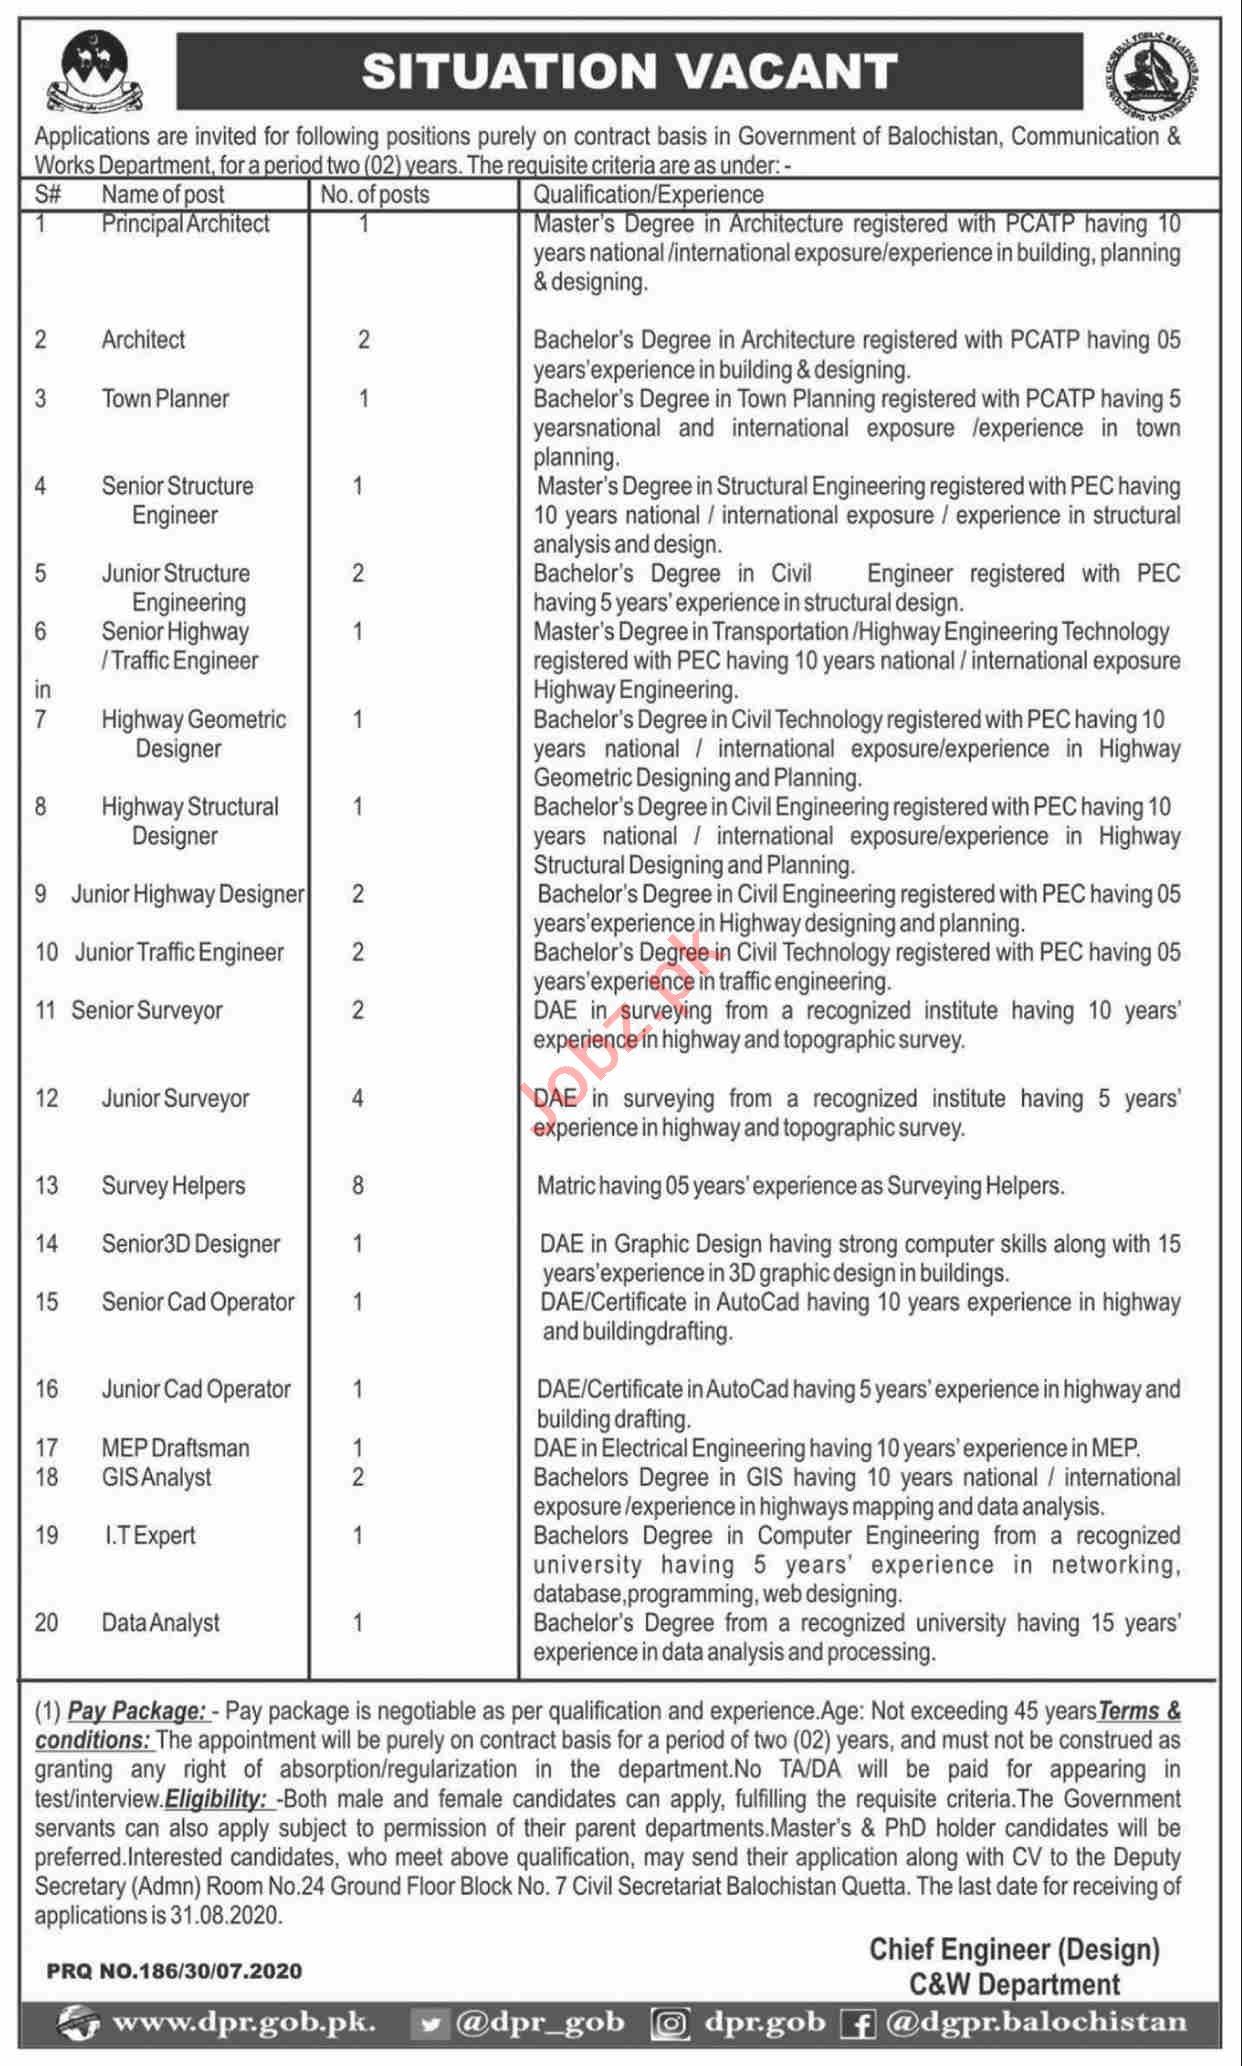 Communication & Works Department C&W Balochistan Jobs 2020